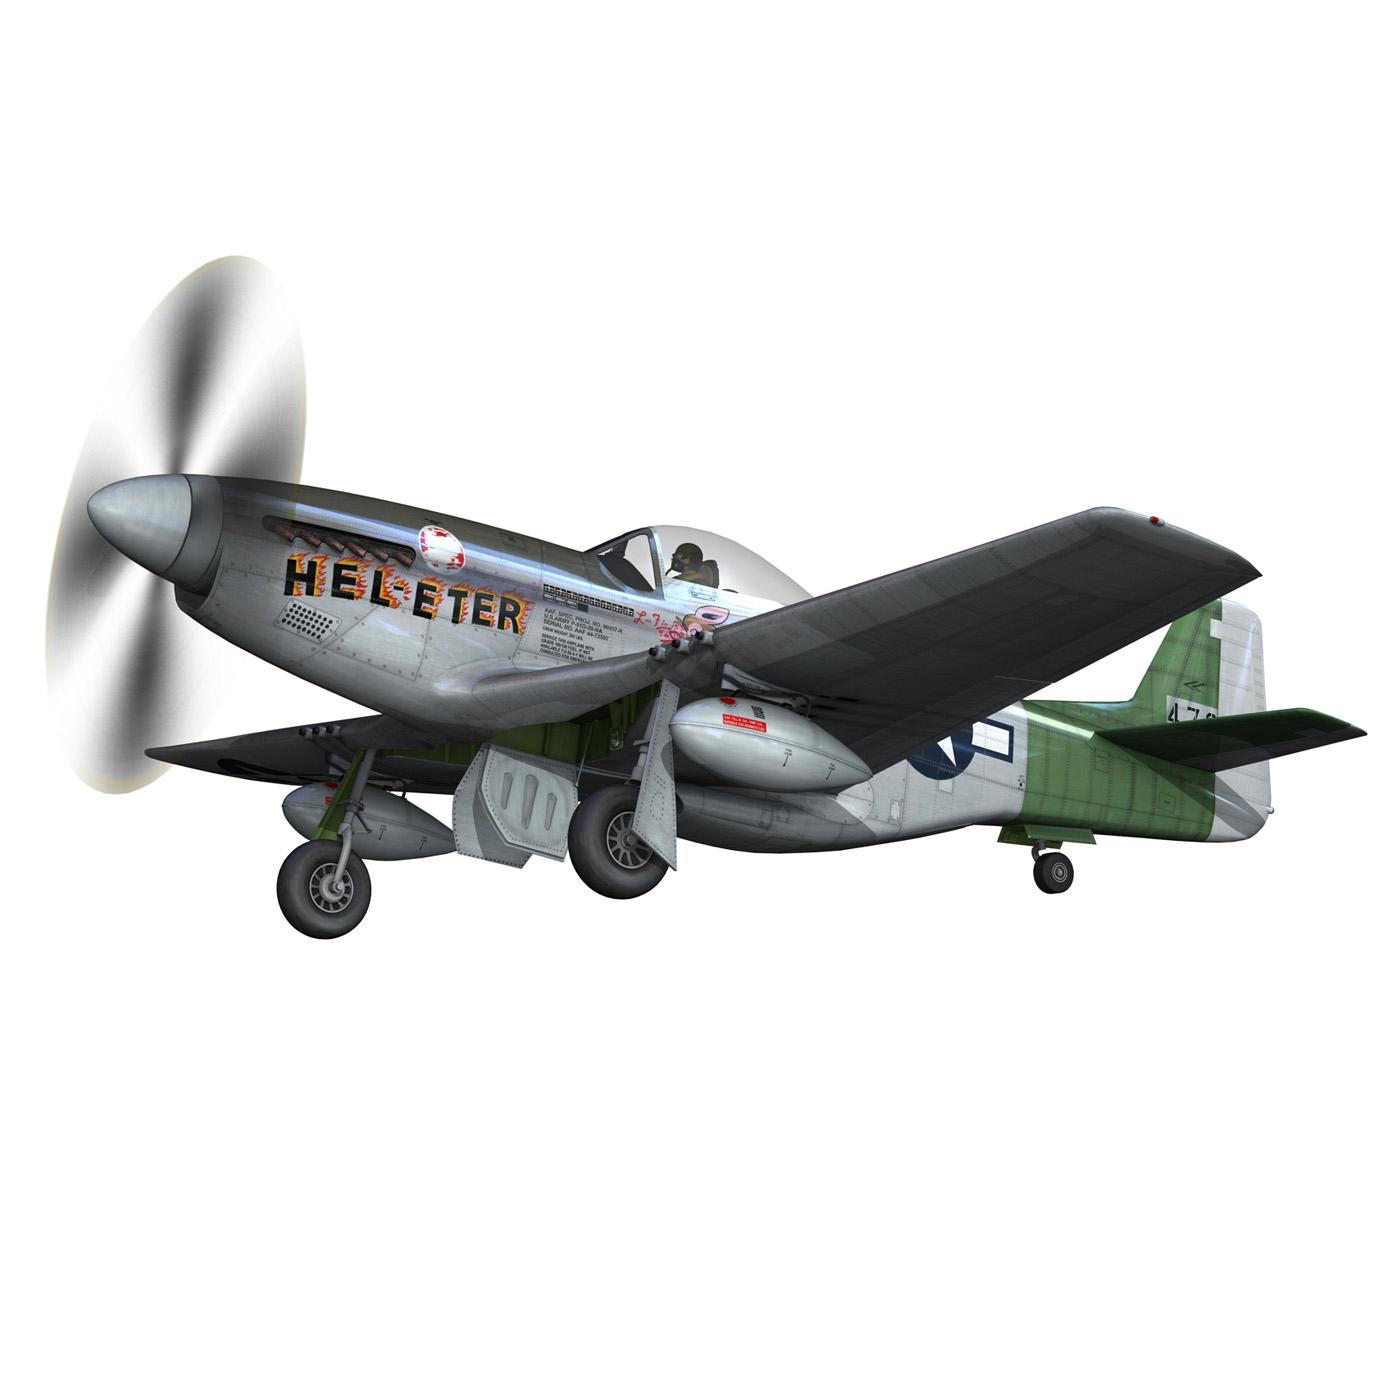 north american p-51d – mustang – heleter 3d model fbx c4d lwo obj 267547